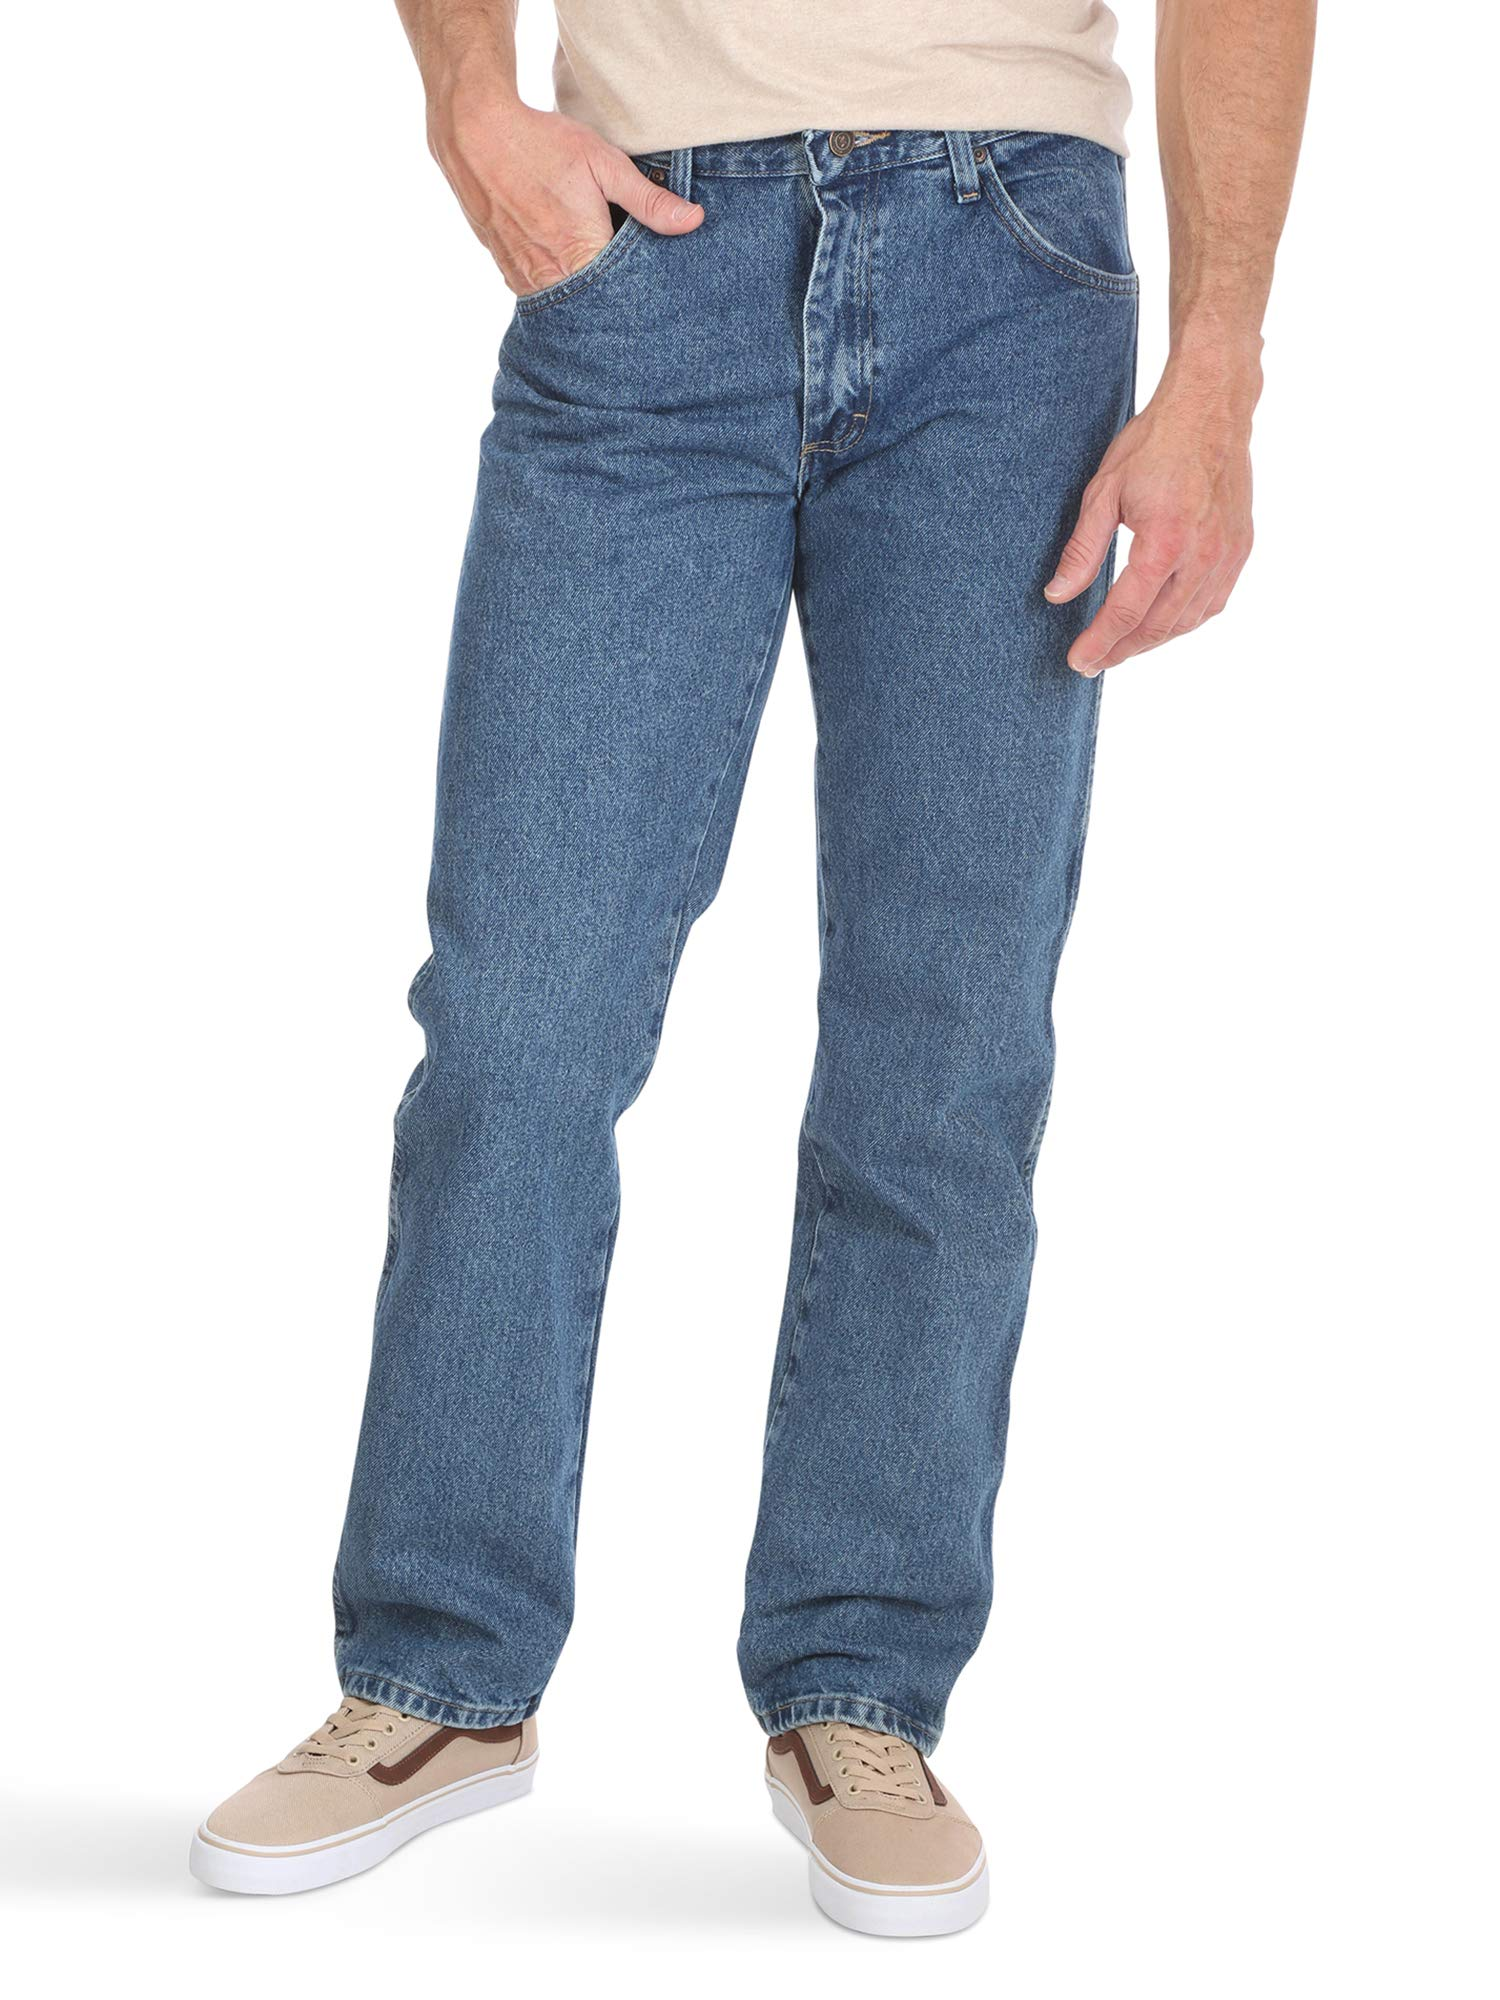 e576042d Galleon - Wrangler Authentics Men's Big And Tall Classic Regular Fit Jean,  Stonewash Dark, 56x32